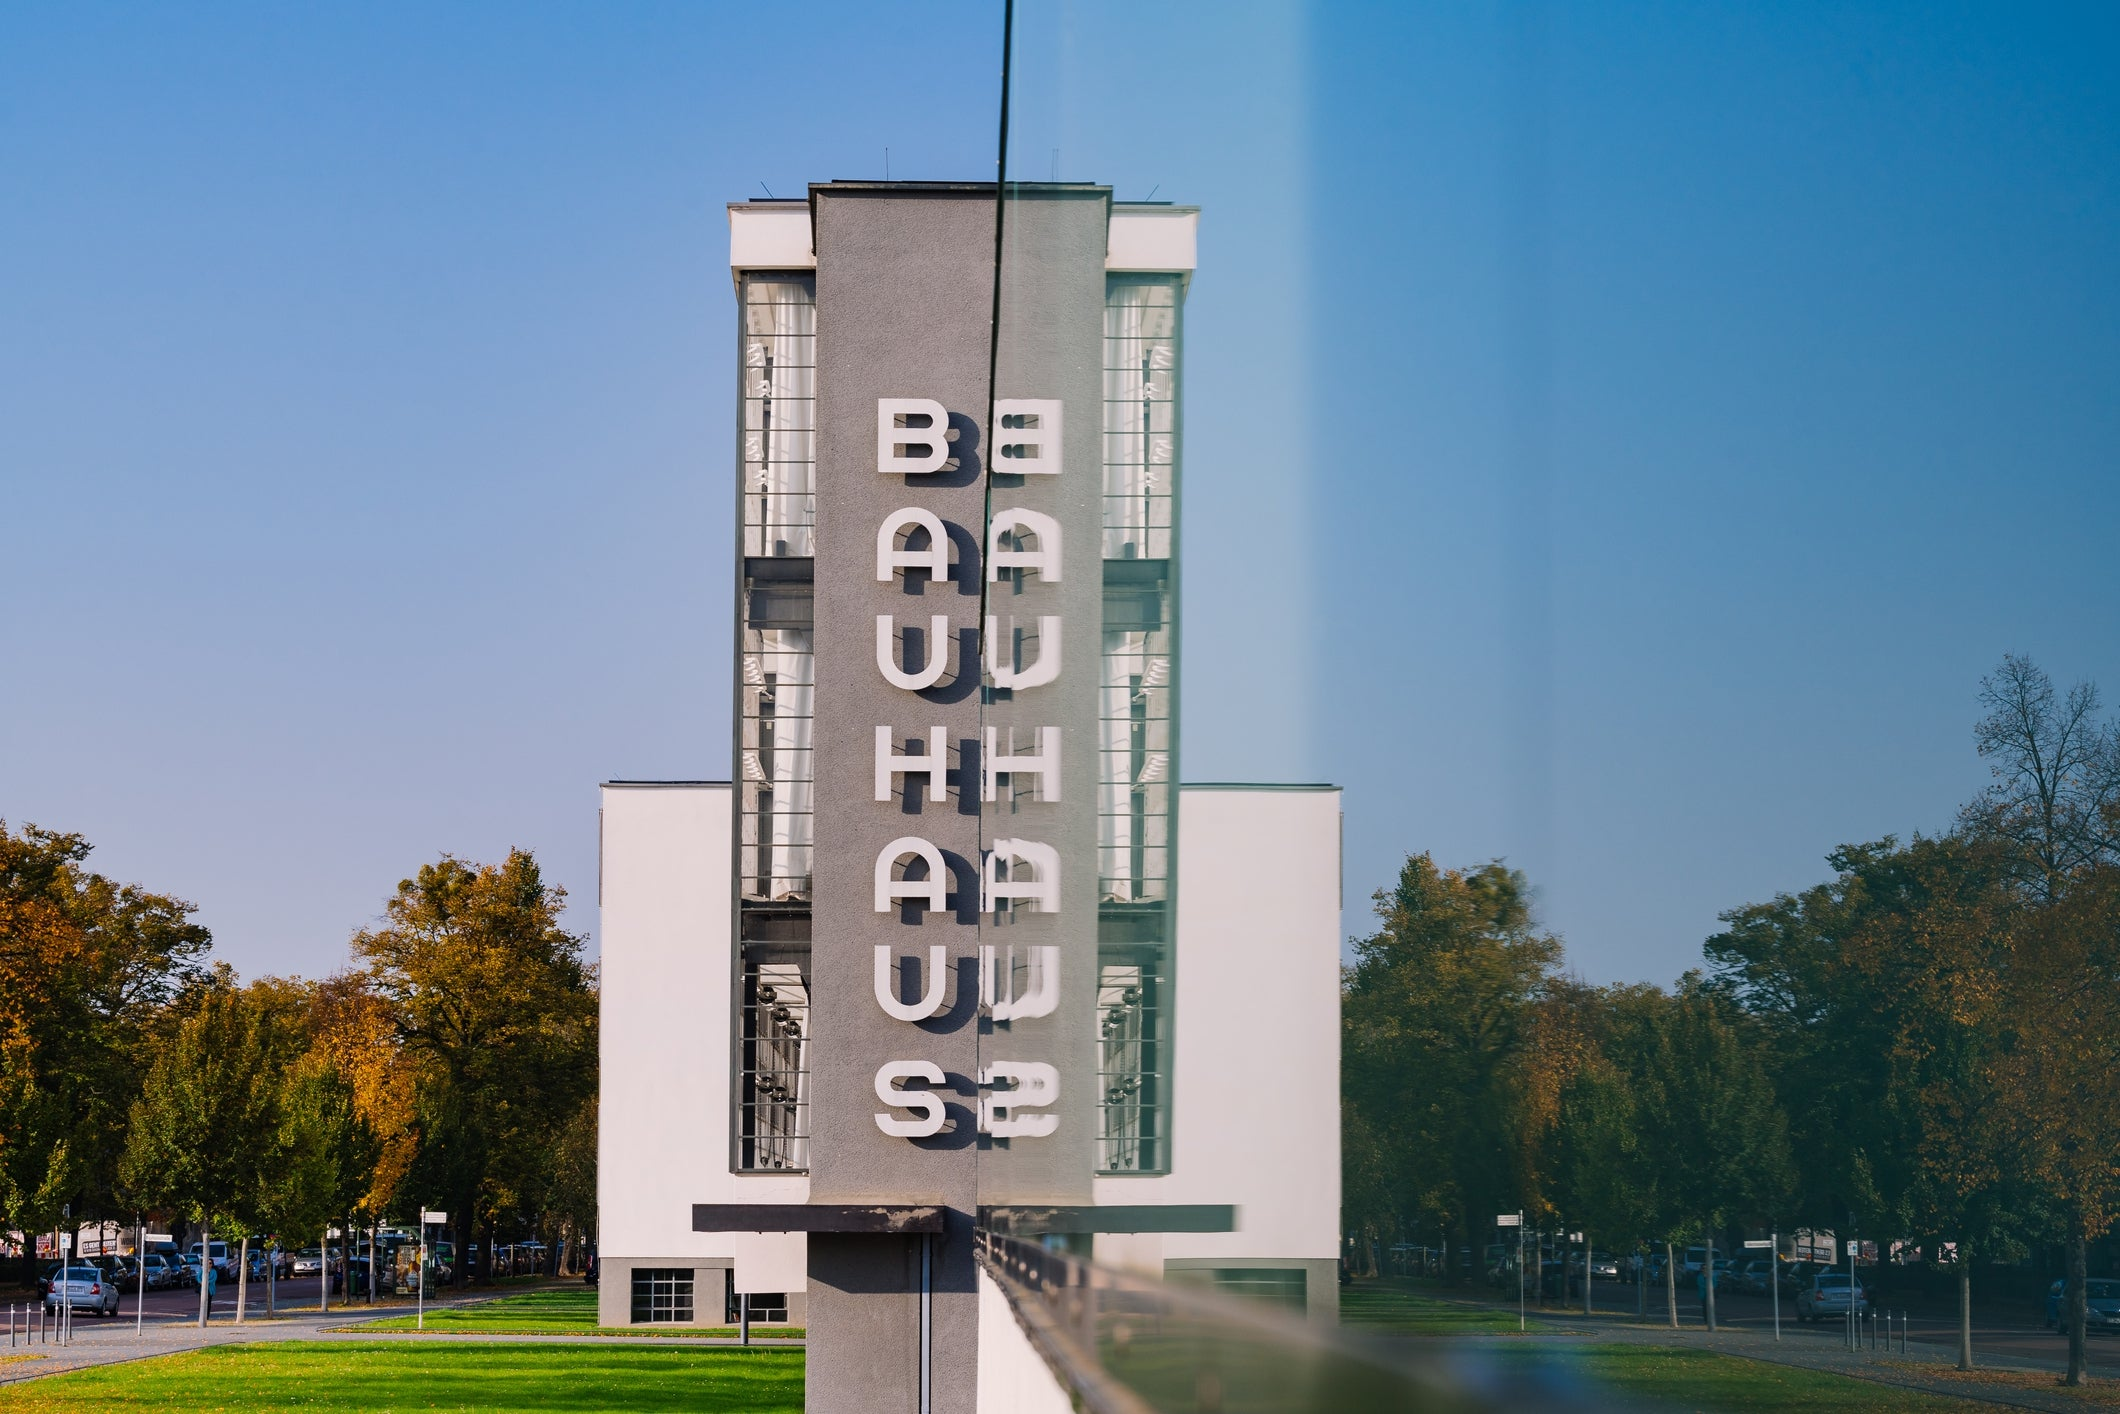 Dessau, Germany: A big birthday for Bauhaus